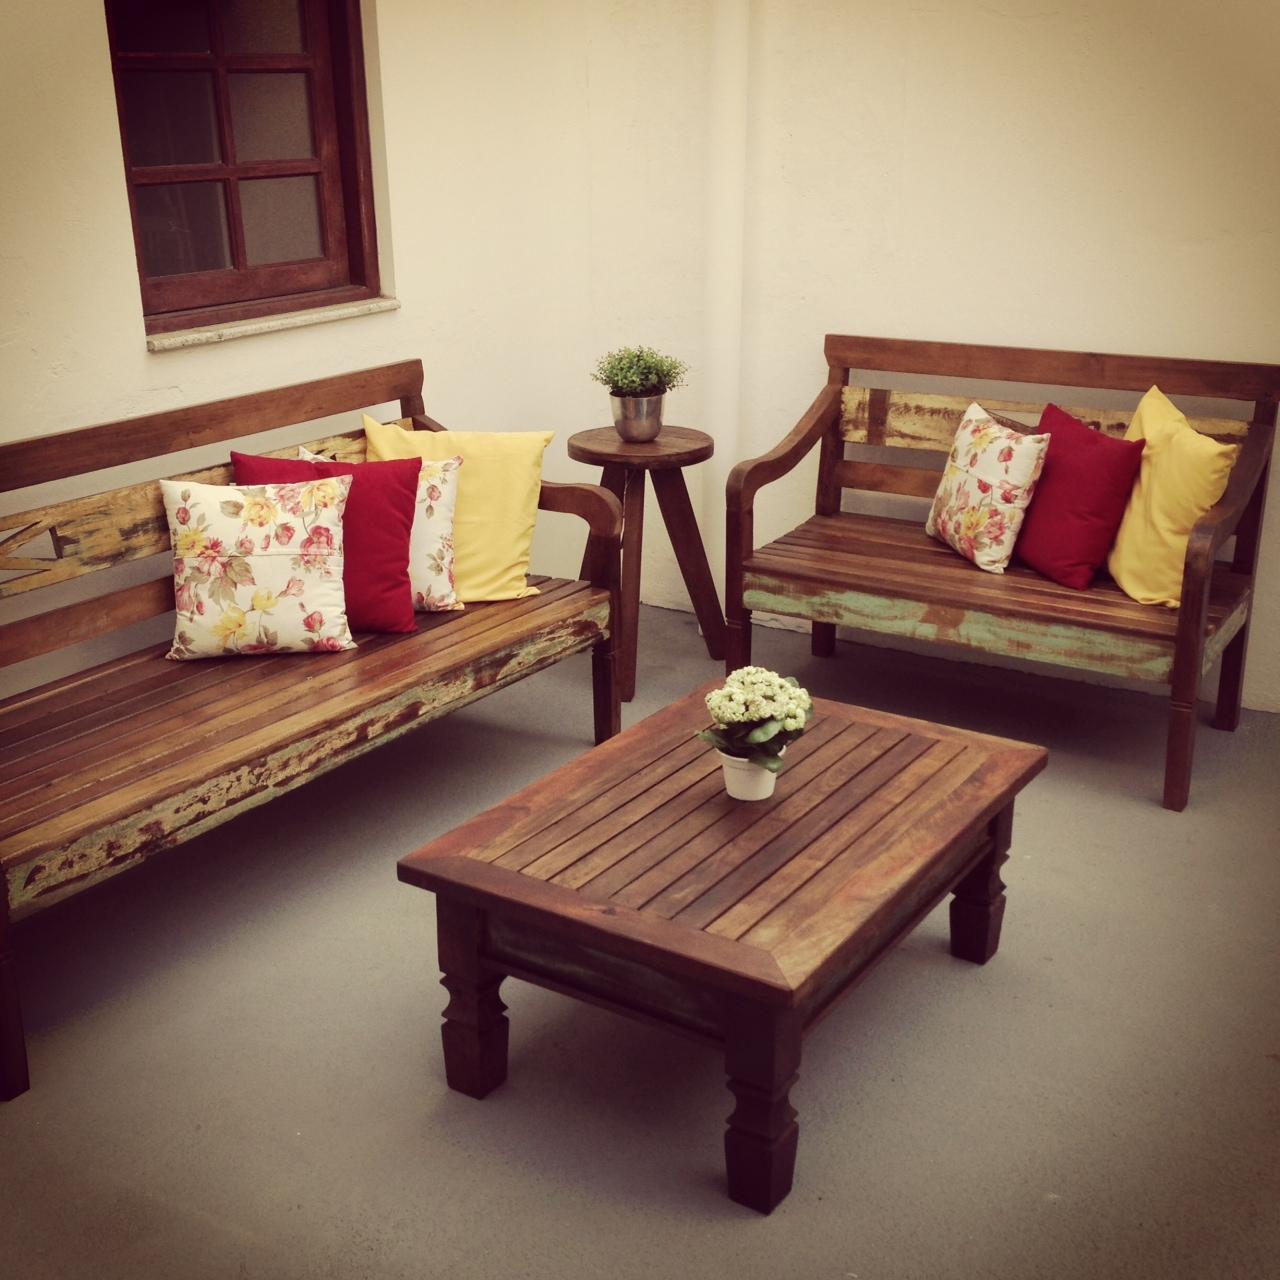 Casa Mix: Móveis para área externa #A62538 1280x1280